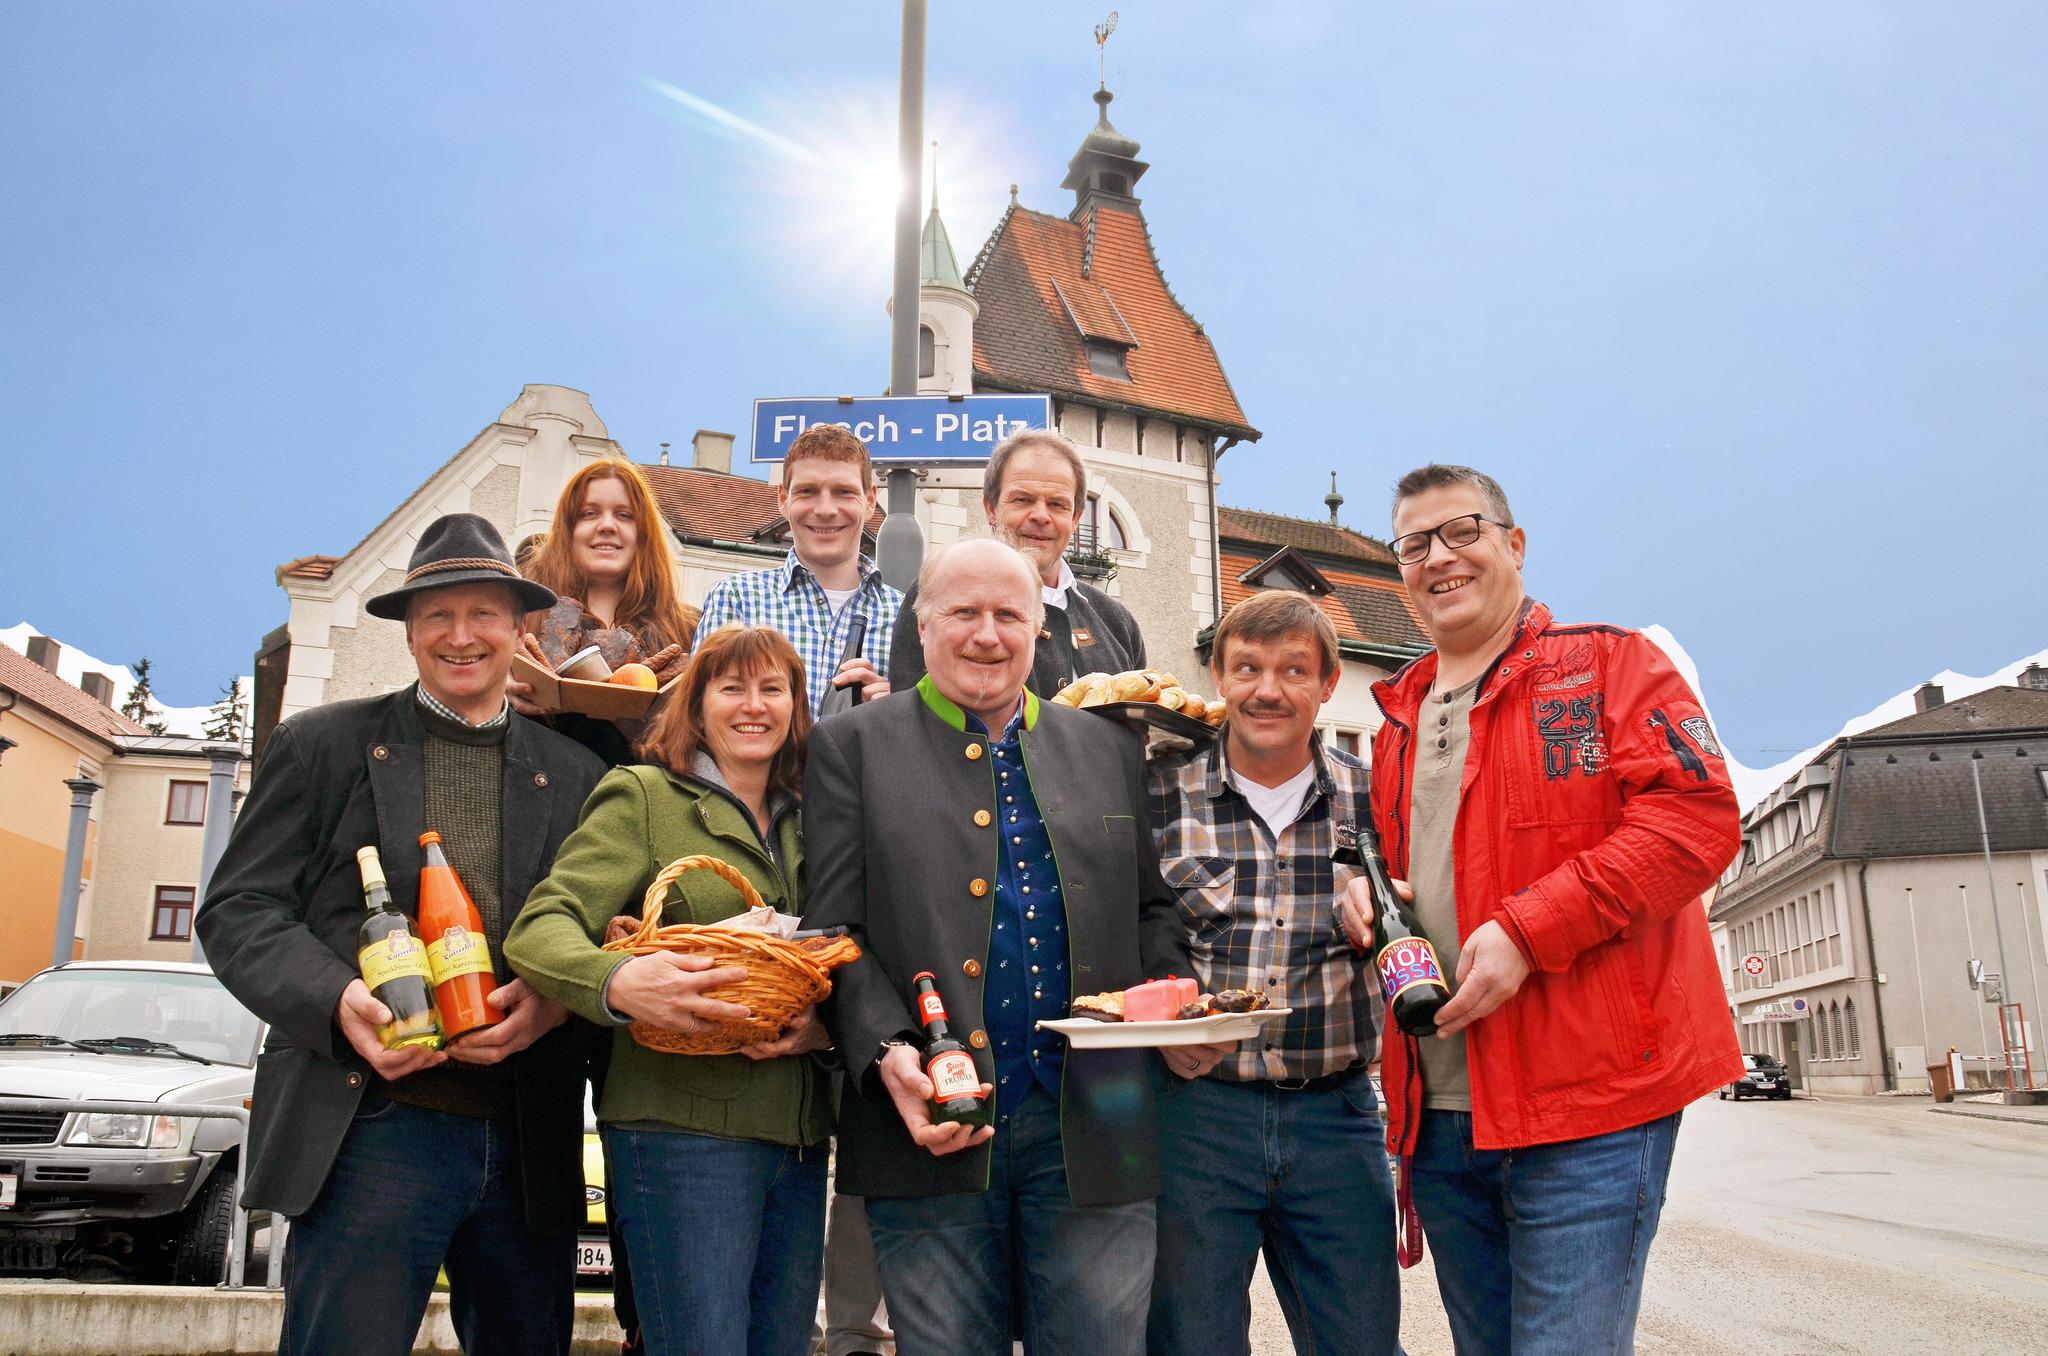 Partnerschaft in Wilhelmsburg - Bekanntschaften - Quoka